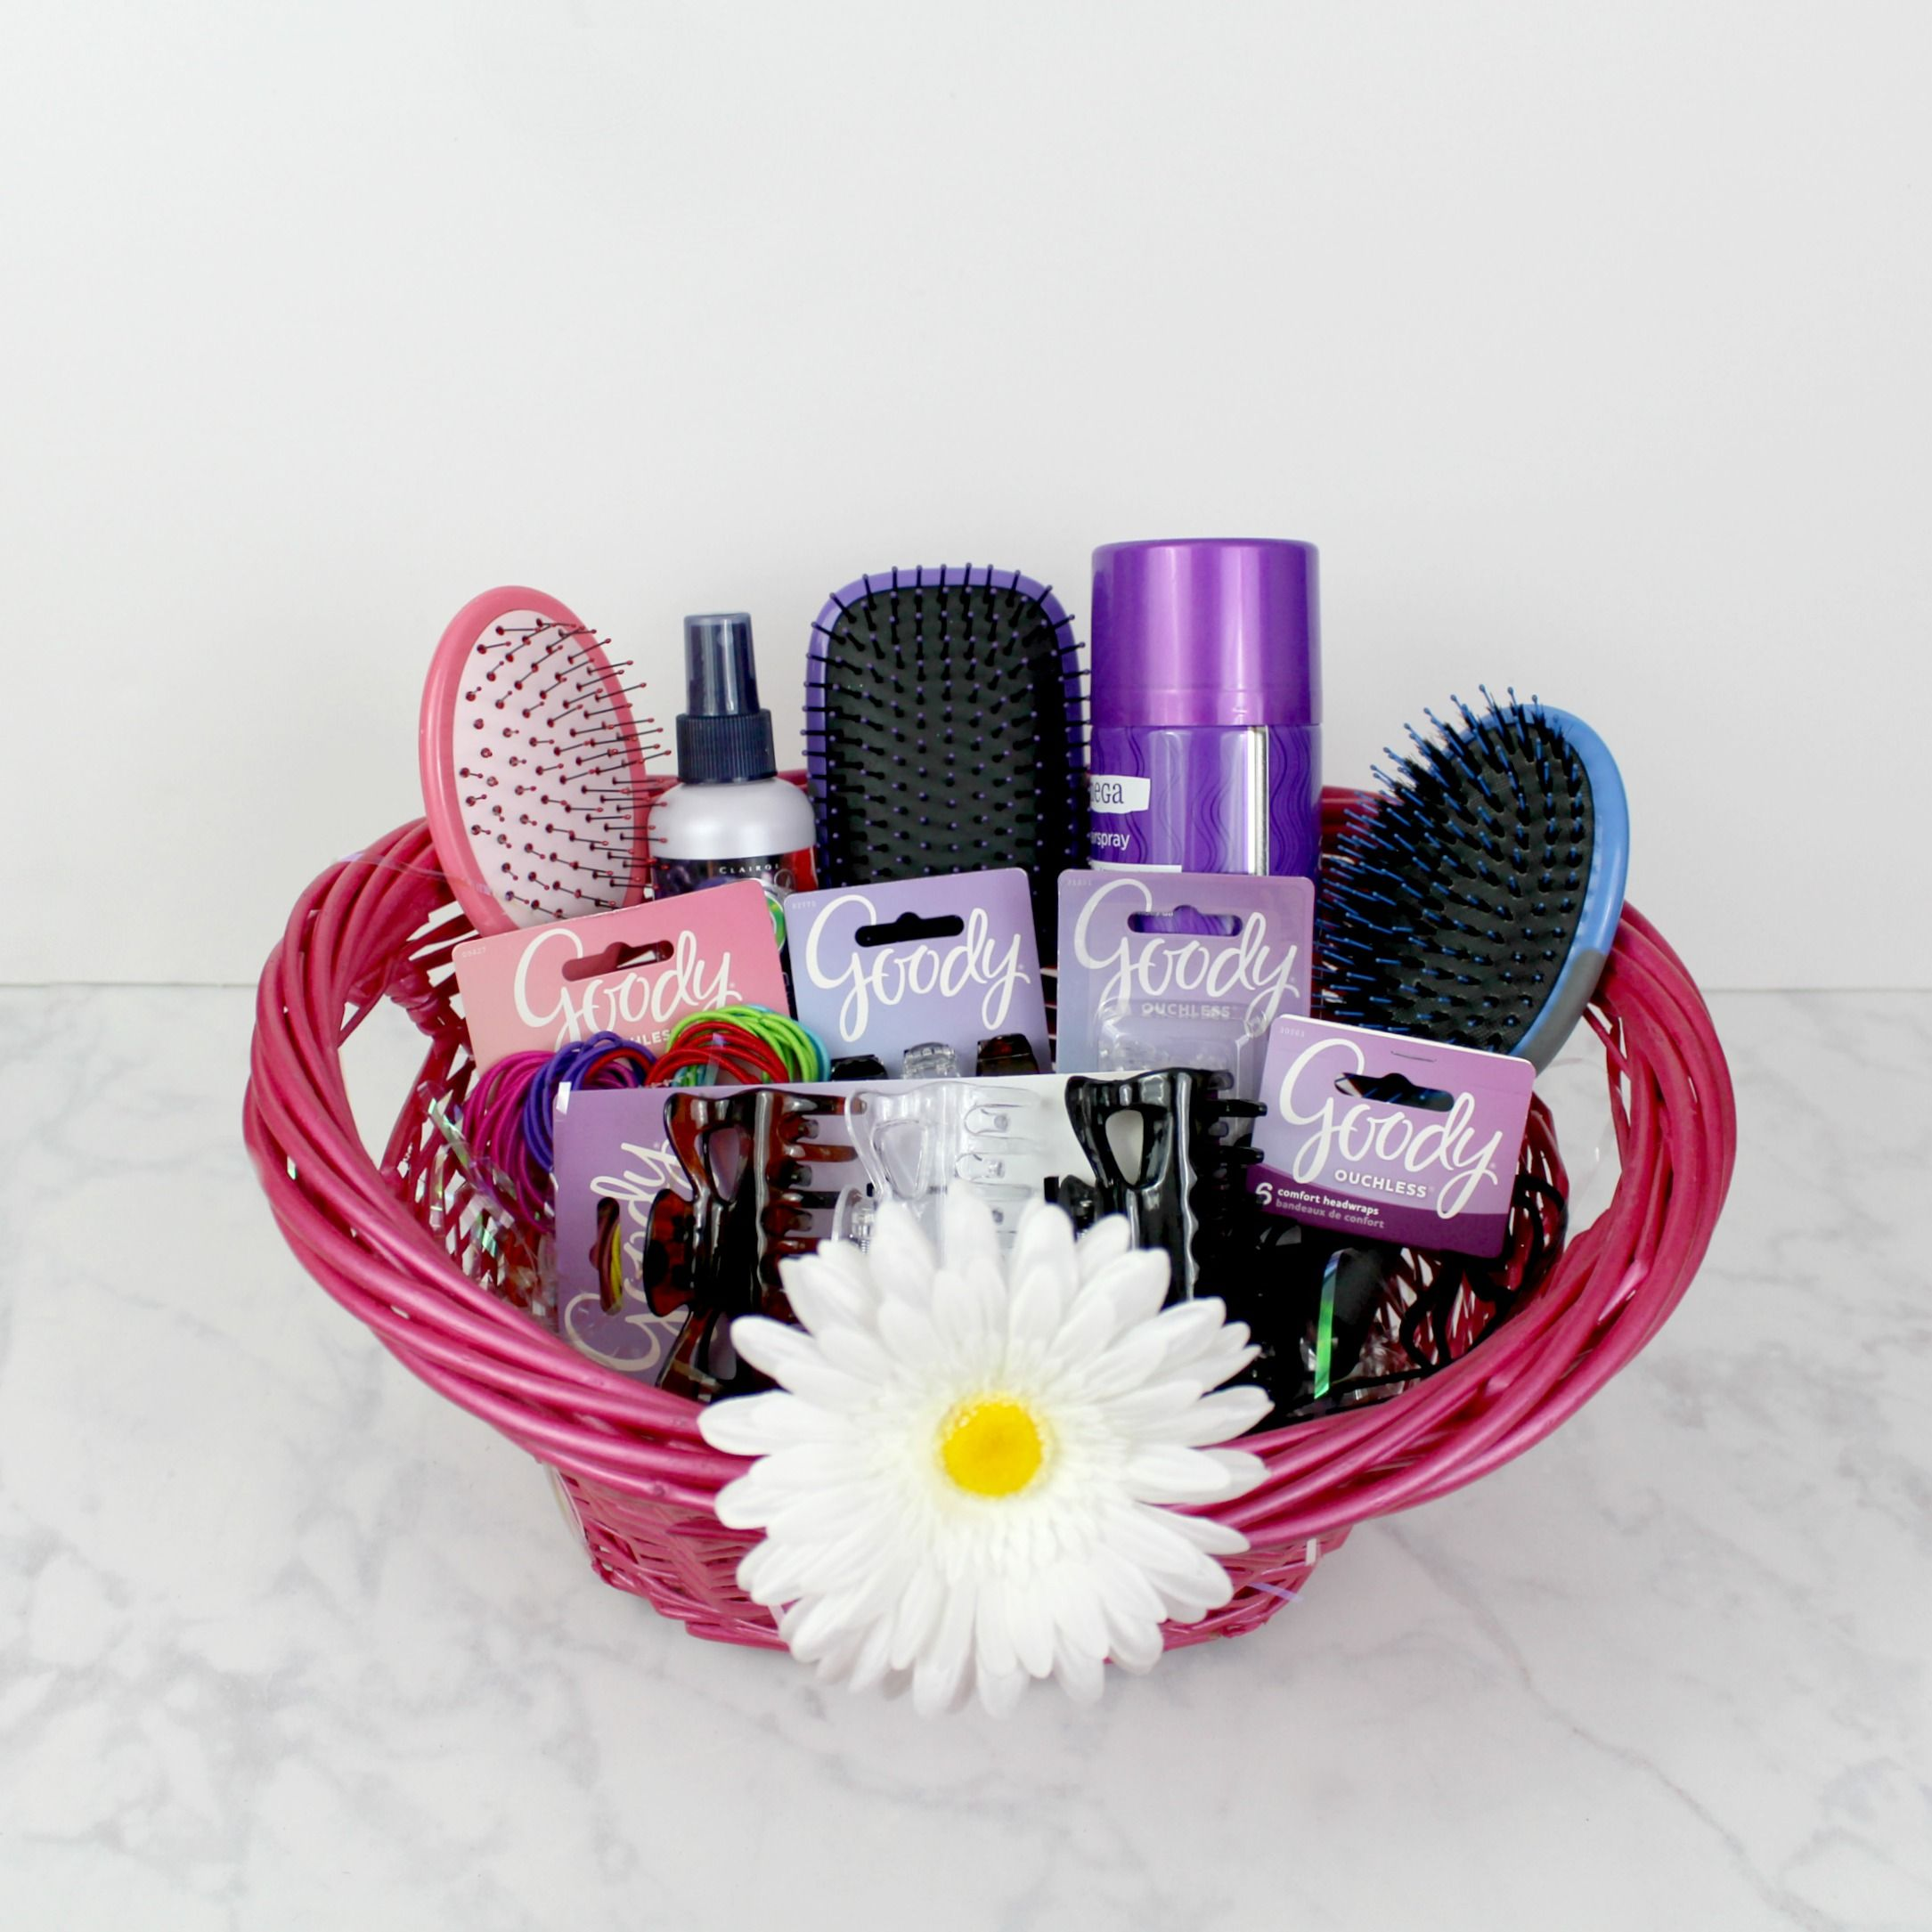 Diy Tween Hair Care Gift Basket Goodybrushed Hair Care Gifts Girl Gift Baskets Hair Product Gift Basket